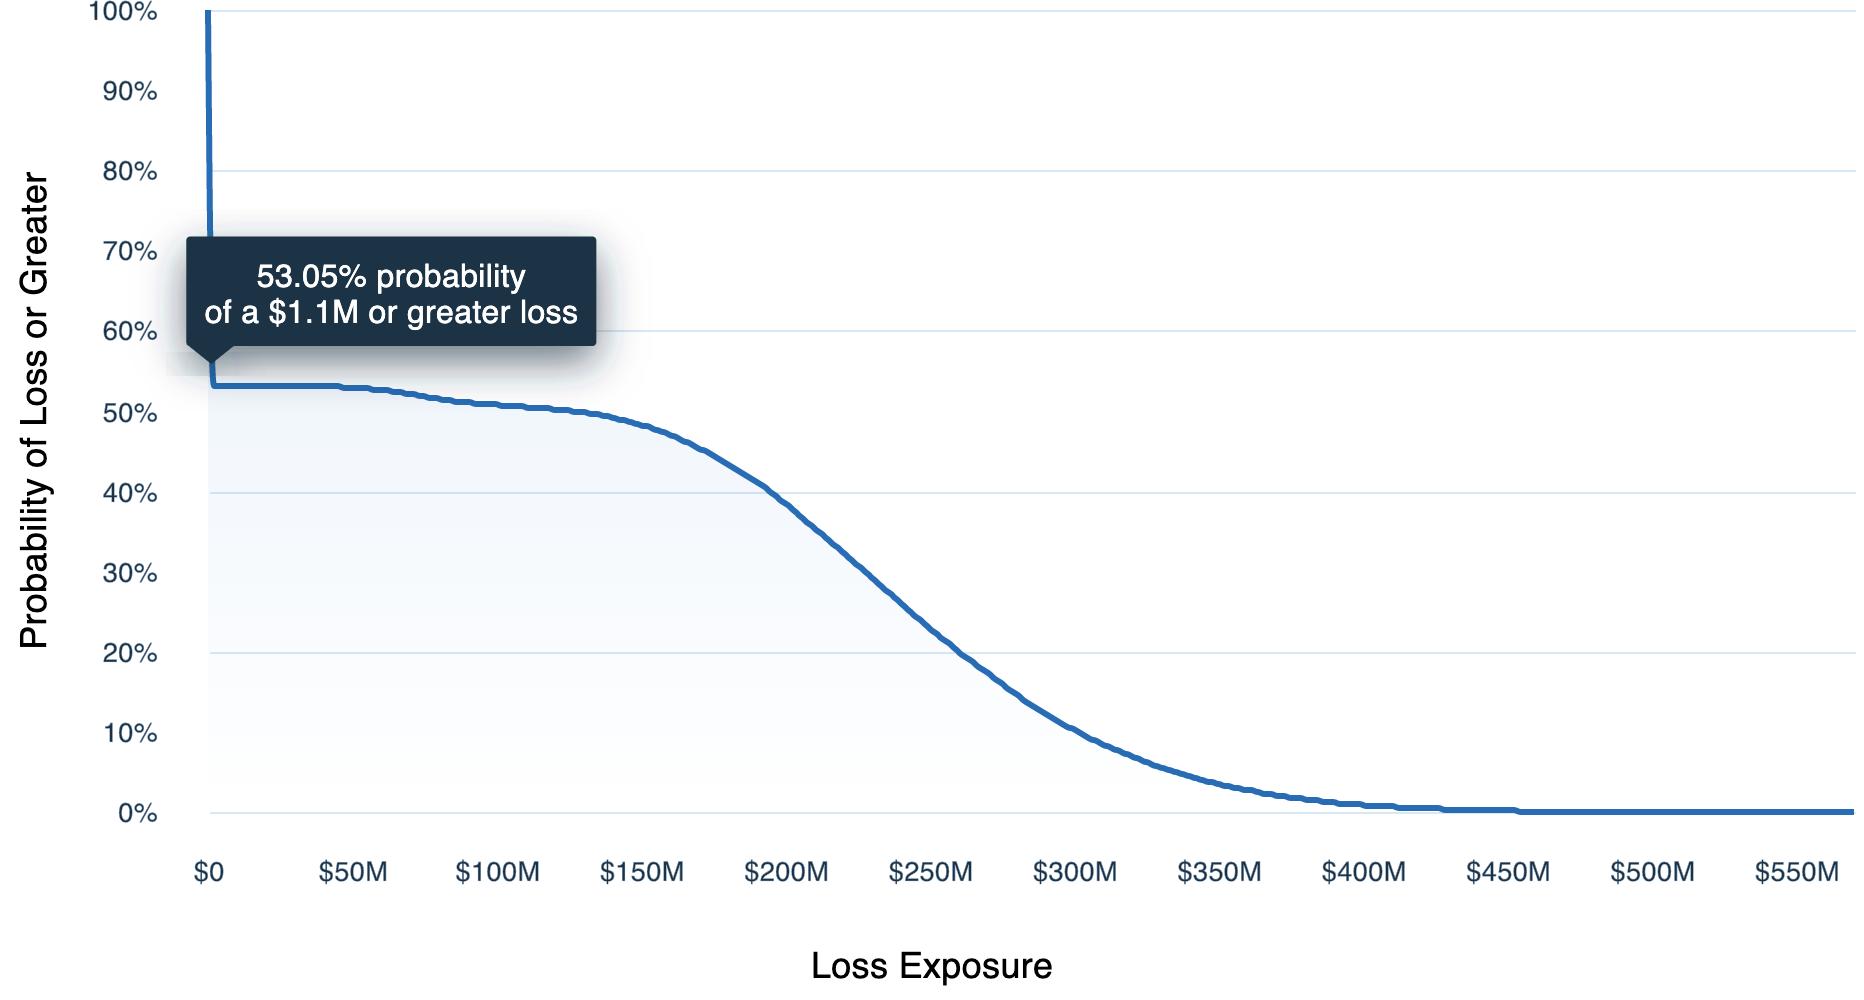 Breach_of_Crown_Jewel_Database_-_External_Loss_Exceedance_Chart